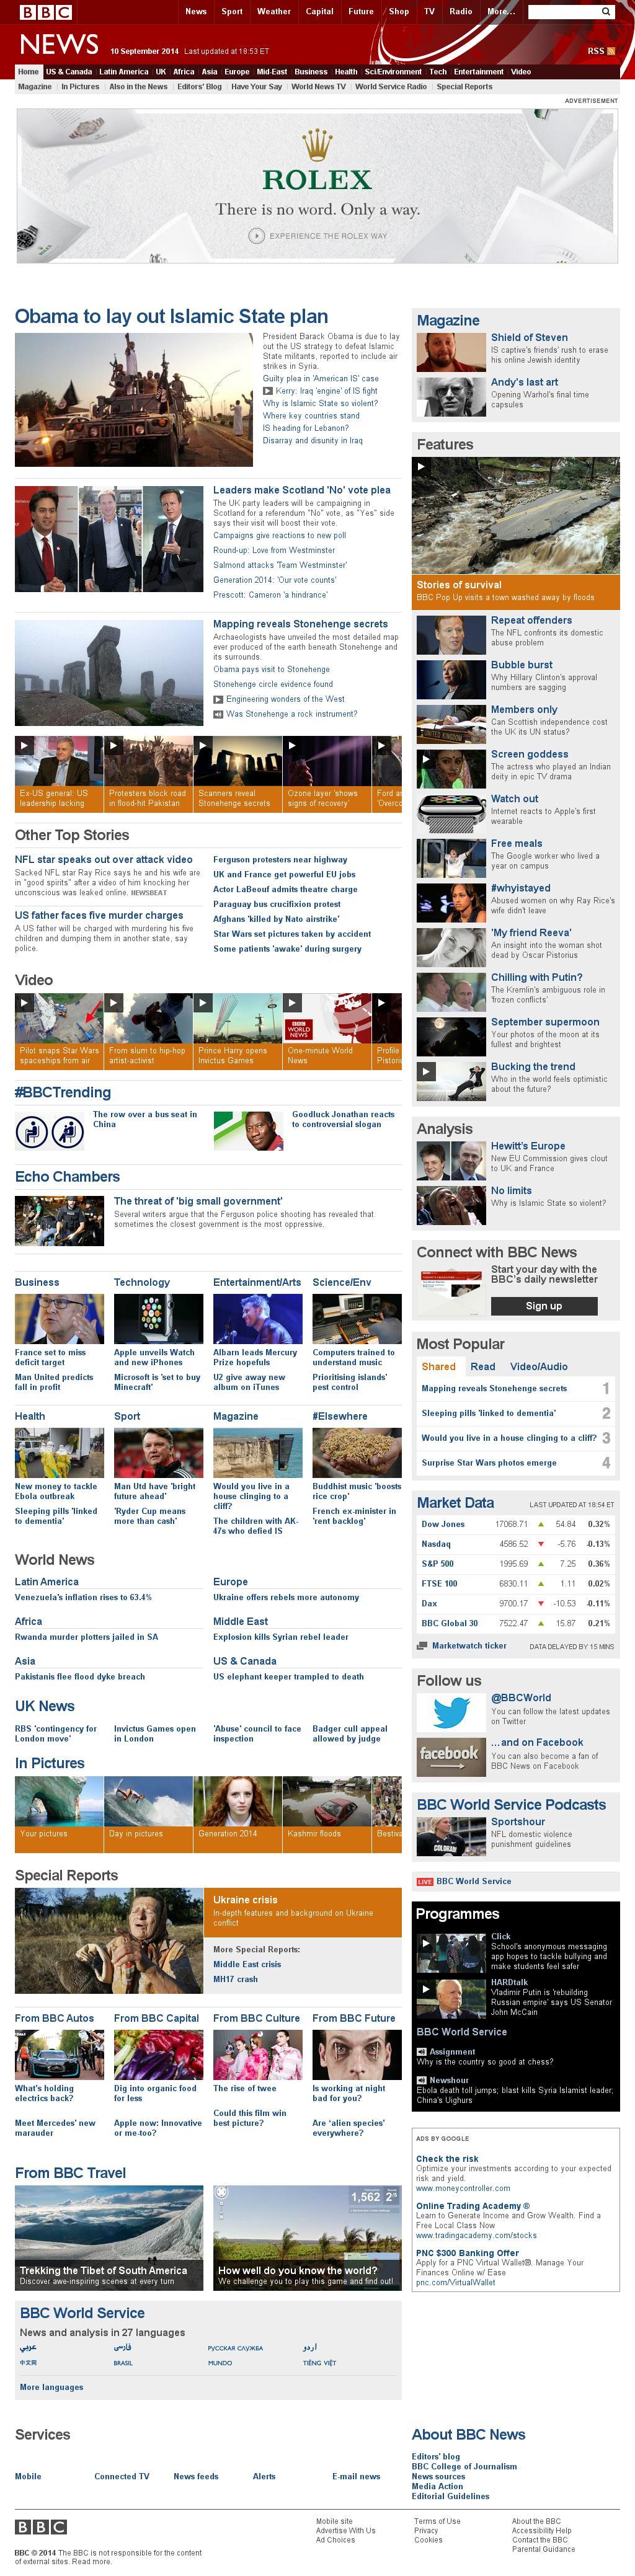 BBC at Wednesday Sept. 10, 2014, 11:01 p.m. UTC